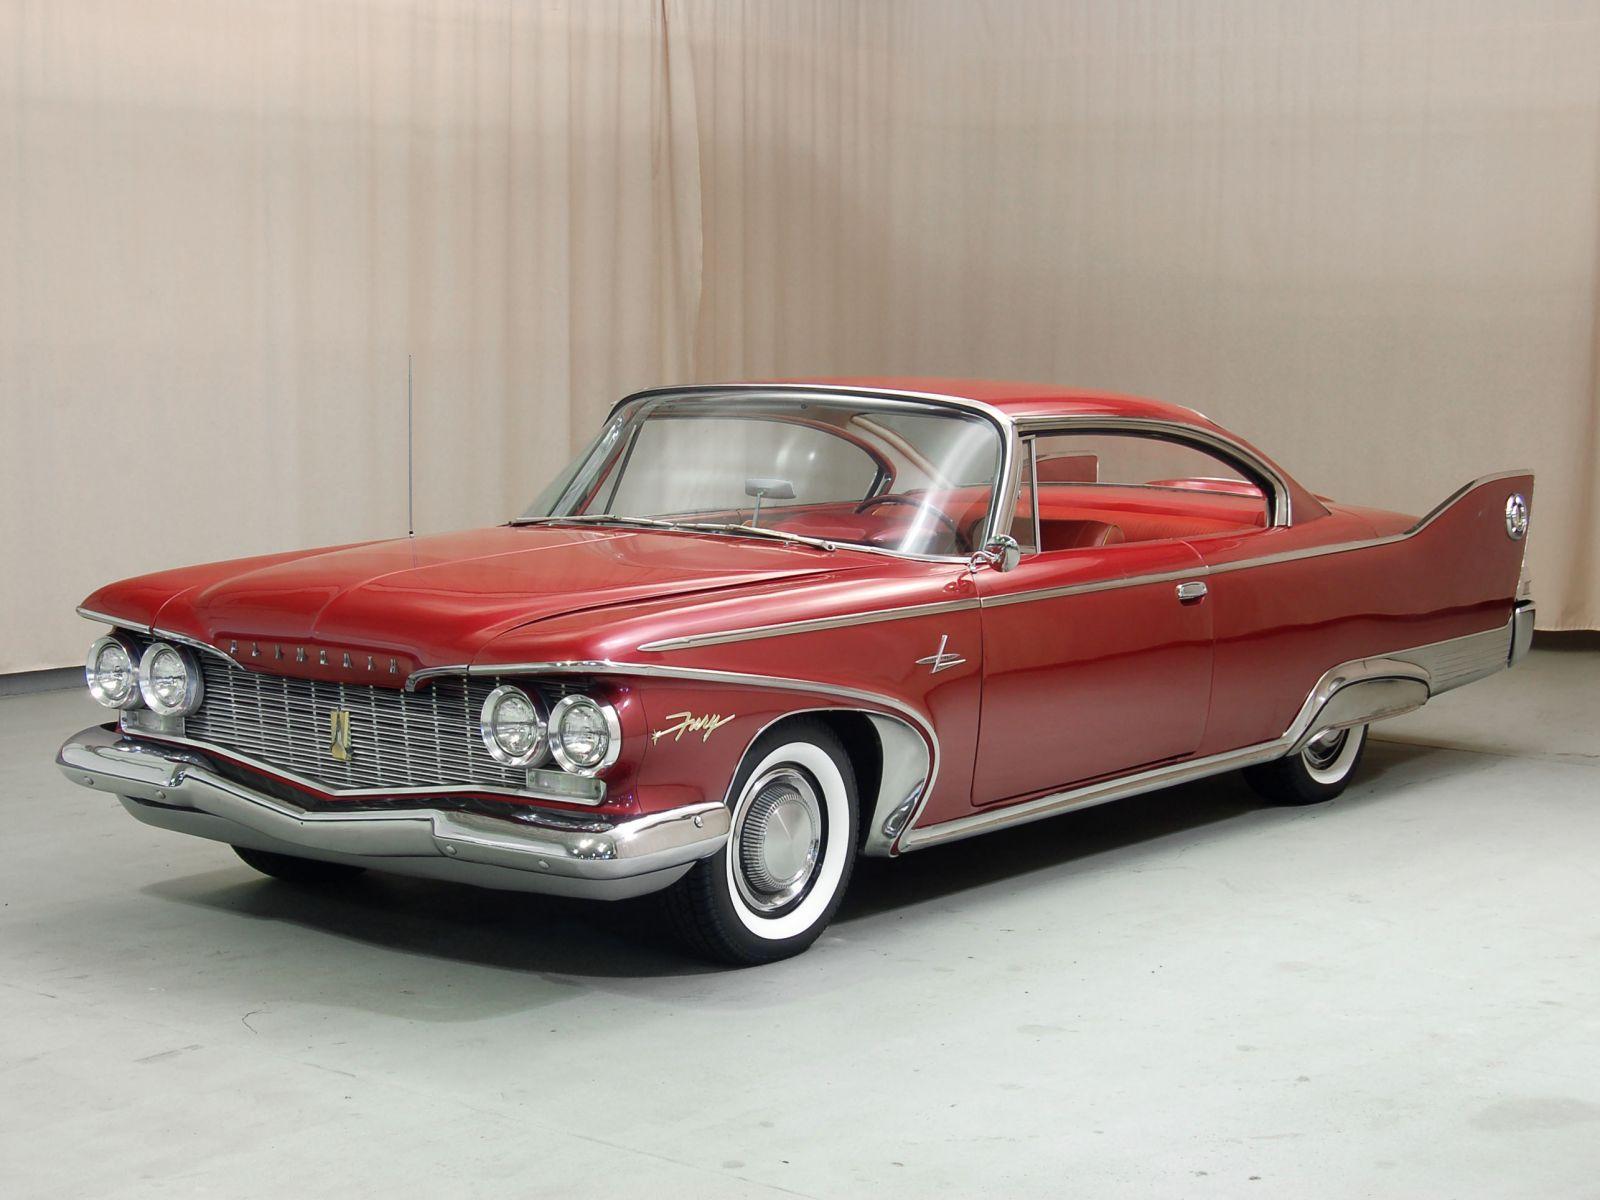 1960 Plymouth Fury | Hyman Ltd. Classic Cars | Pymouth Fury ...